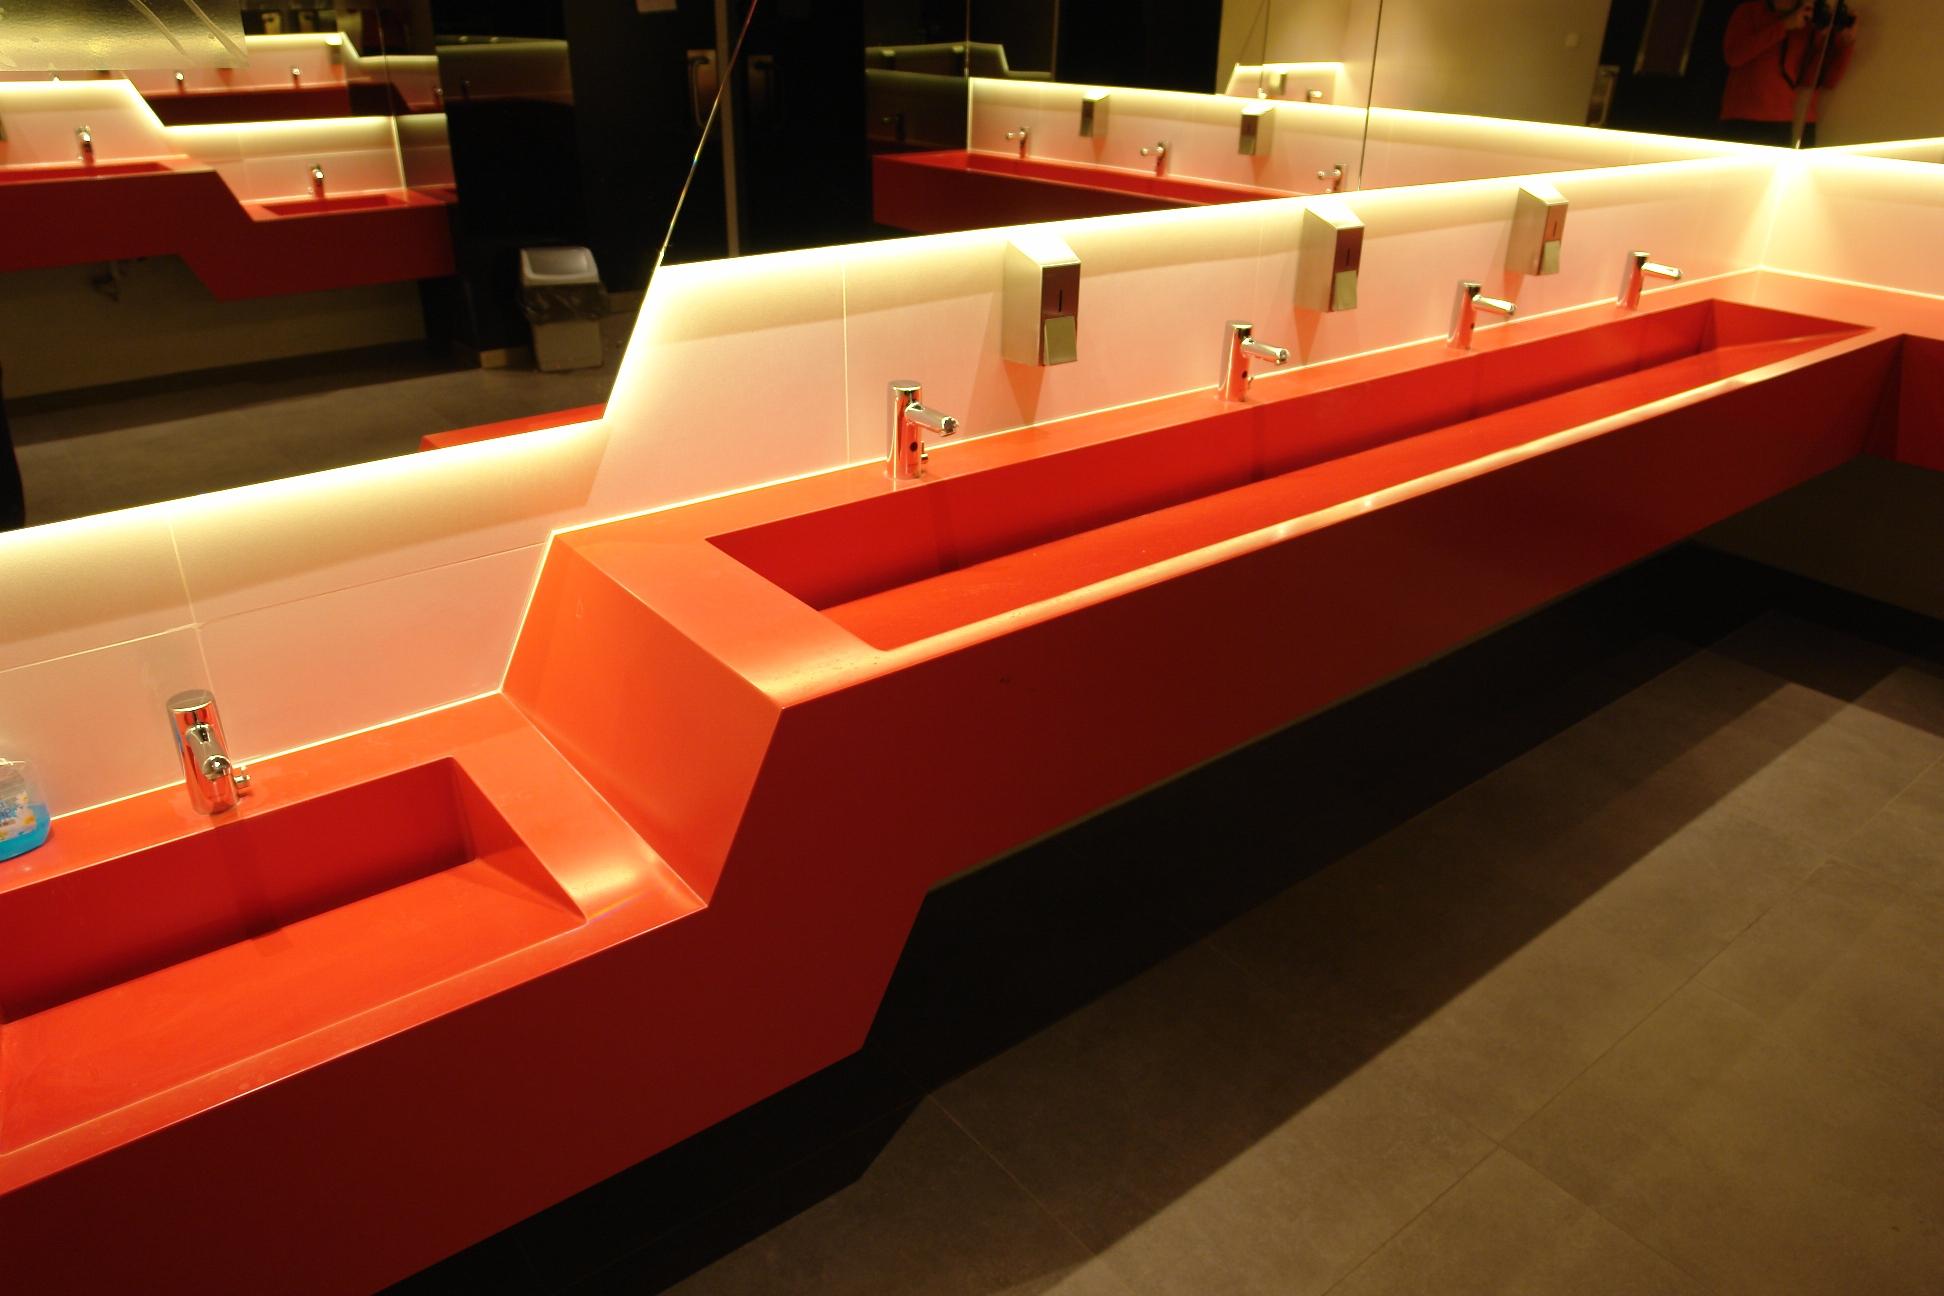 DuPont Corian® közösségforgalmi mosdópultok stadionokba is